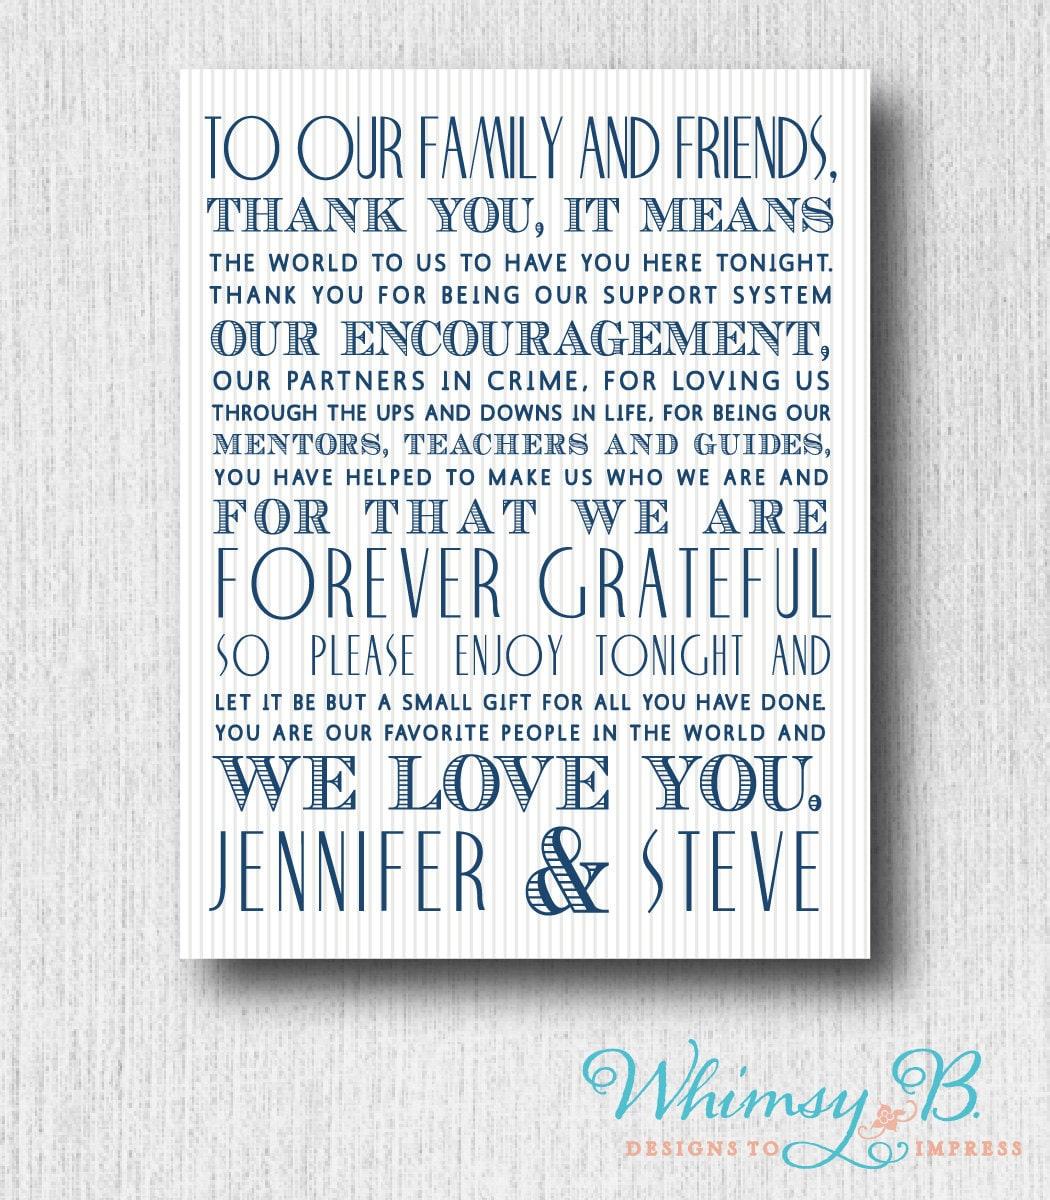 Printable Wedding Invitation Sets is awesome invitations ideas